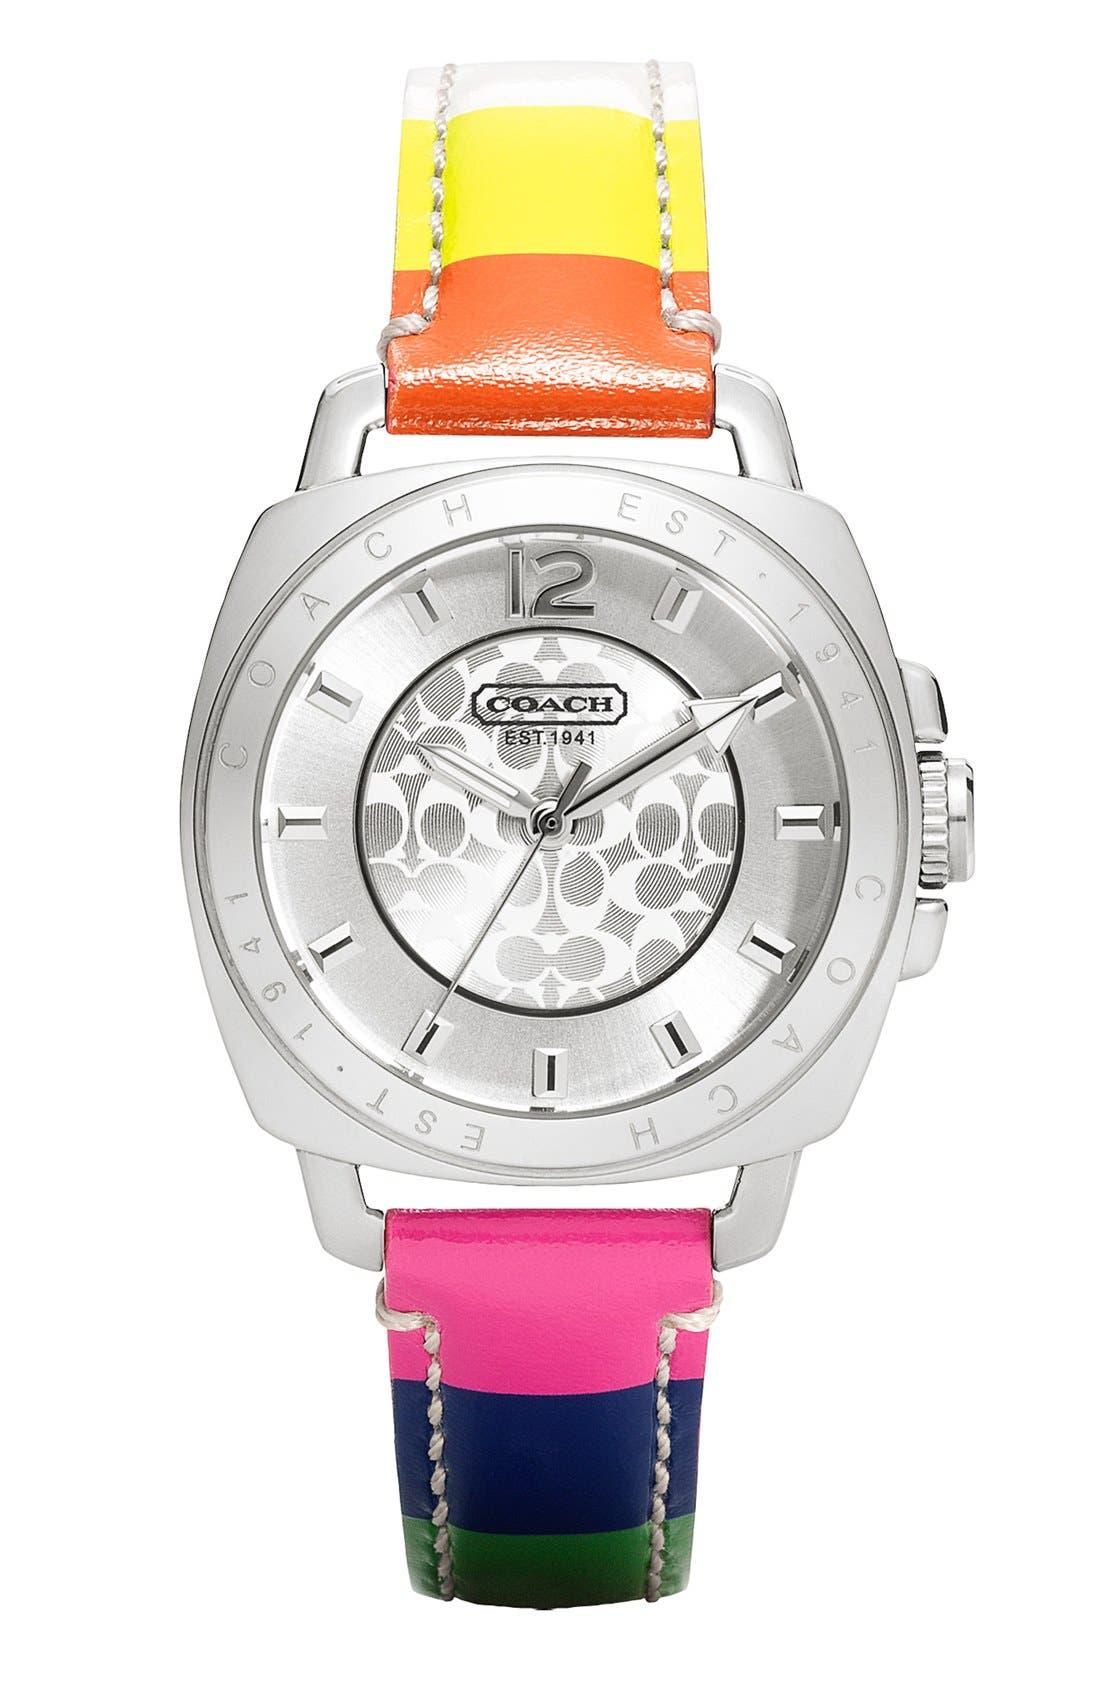 Main Image - COACH 'Boyfriend' Leather Strap Watch, 35mm